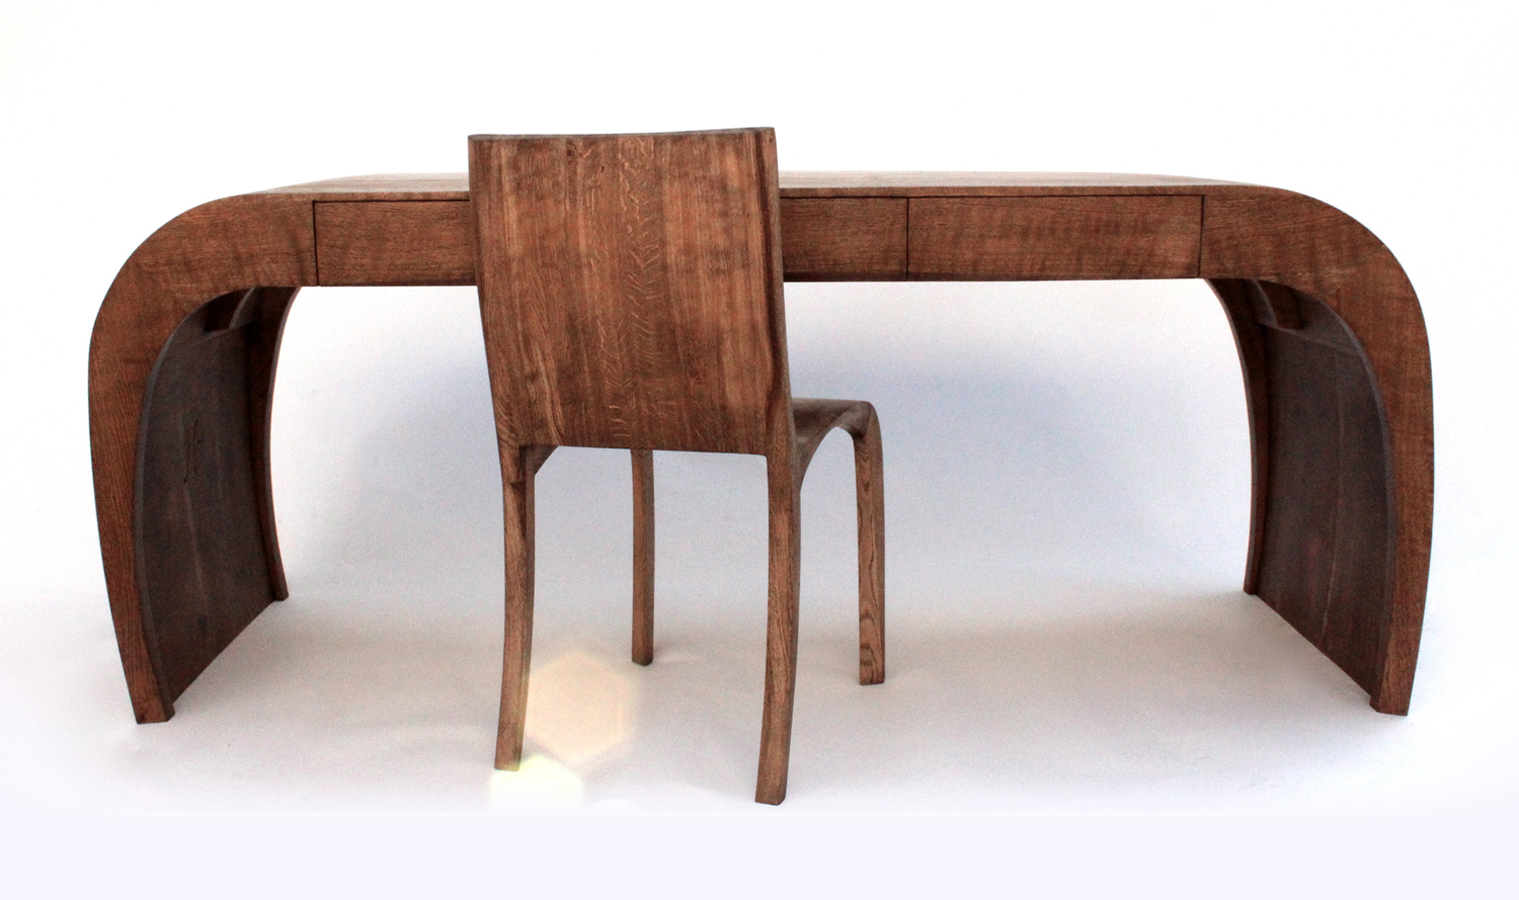 8Caliper-Desk-and-Chair_1.jpg